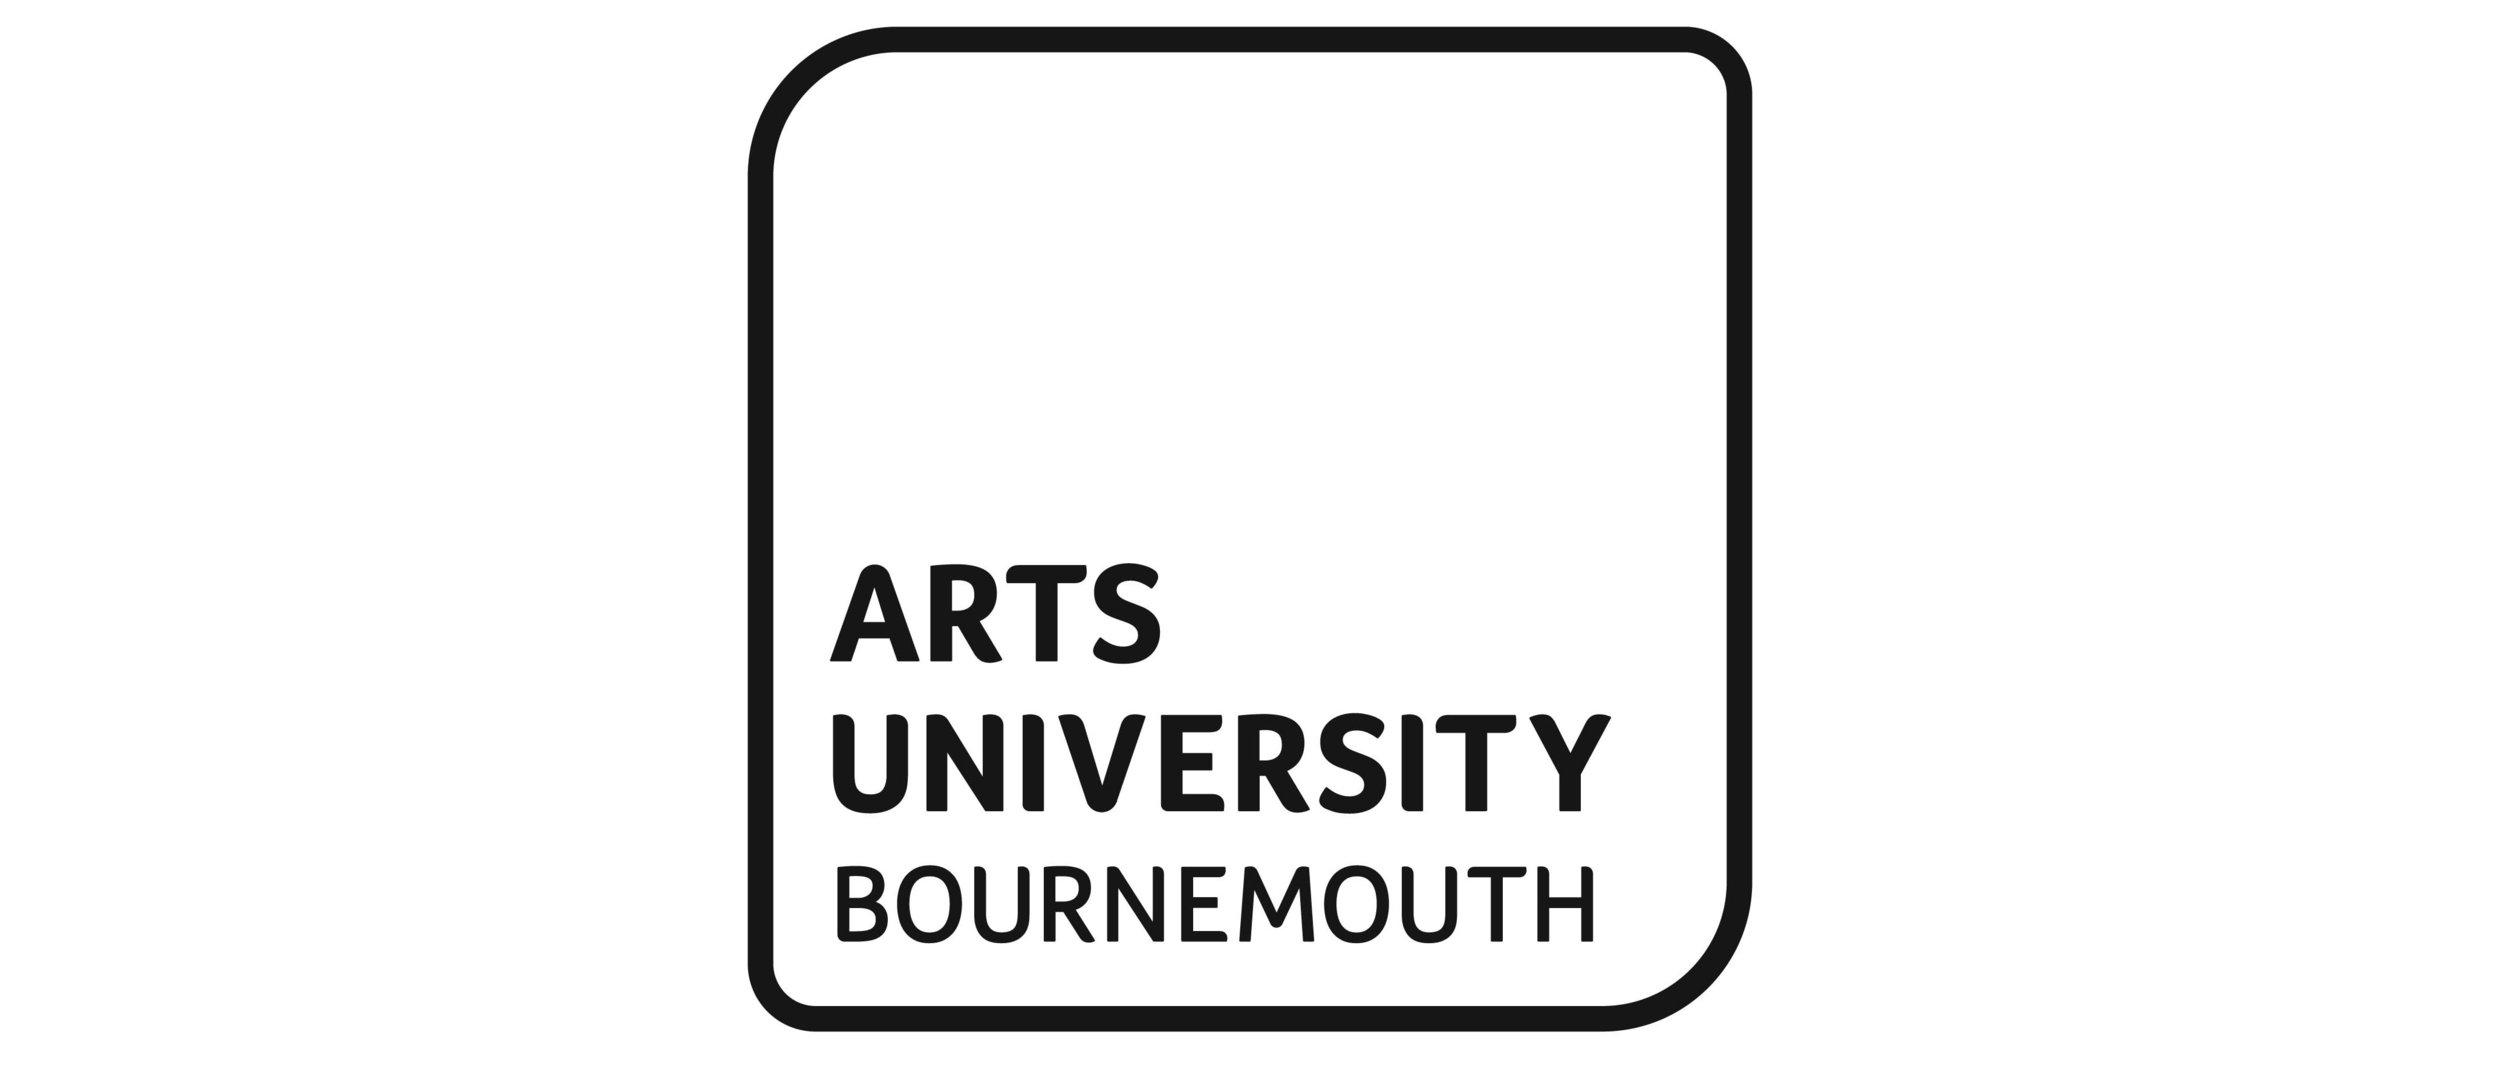 logo - Arts University Bournemouth AUB.jpg